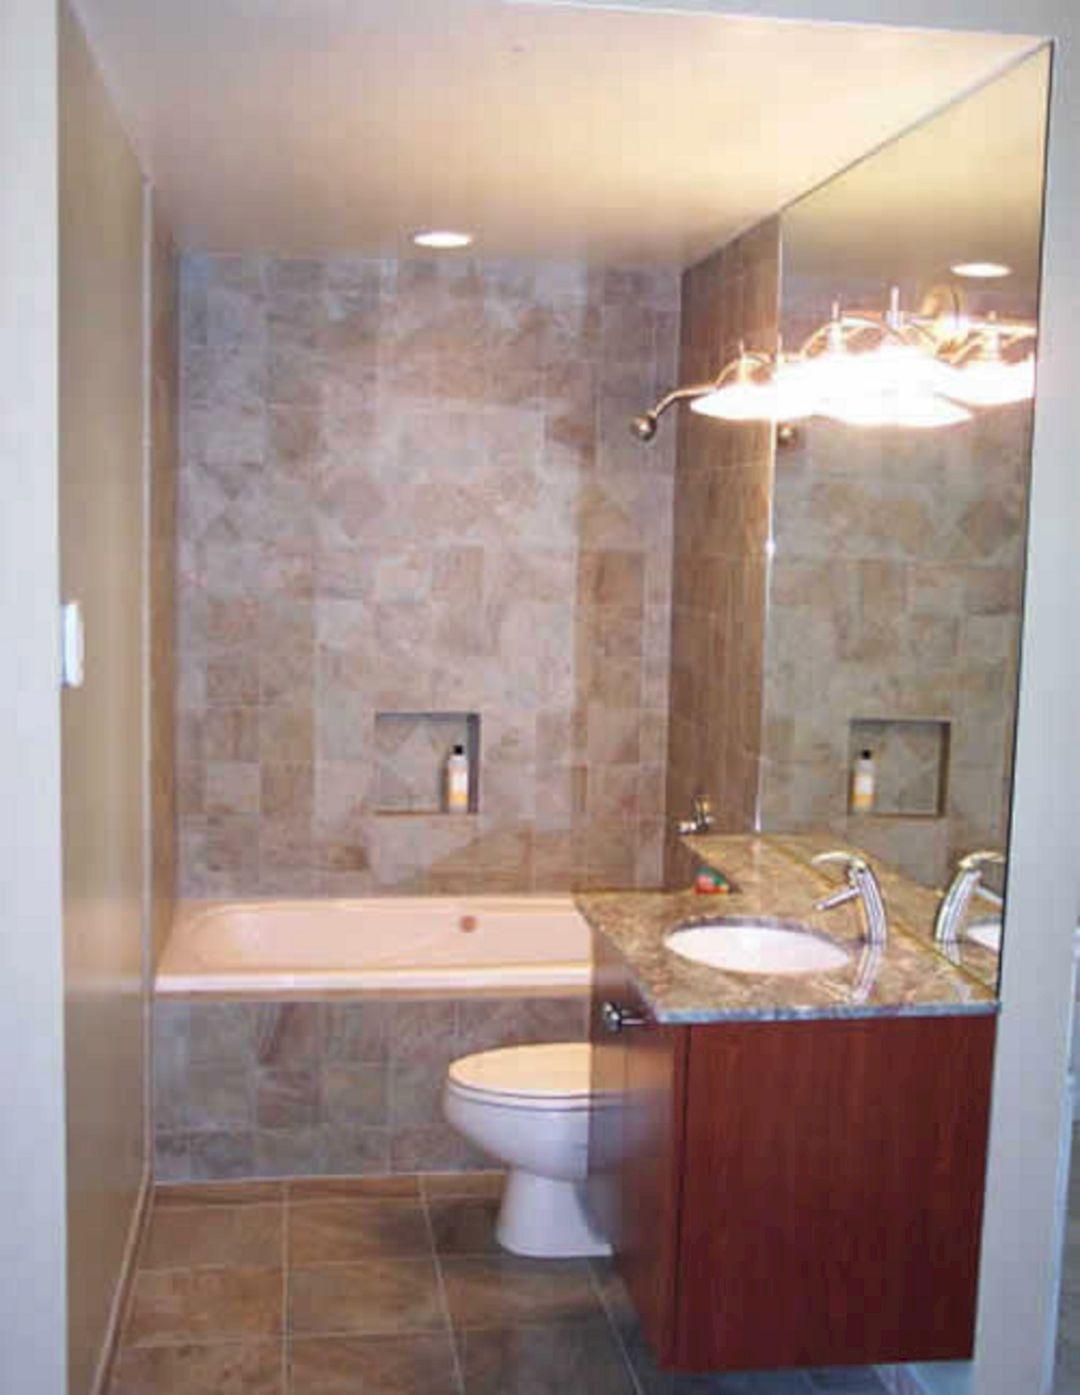 Very Small Bathroom Ideas (Very Small Bathroom Ideas ... on Small Bathroom Ideas Photo Gallery id=45966